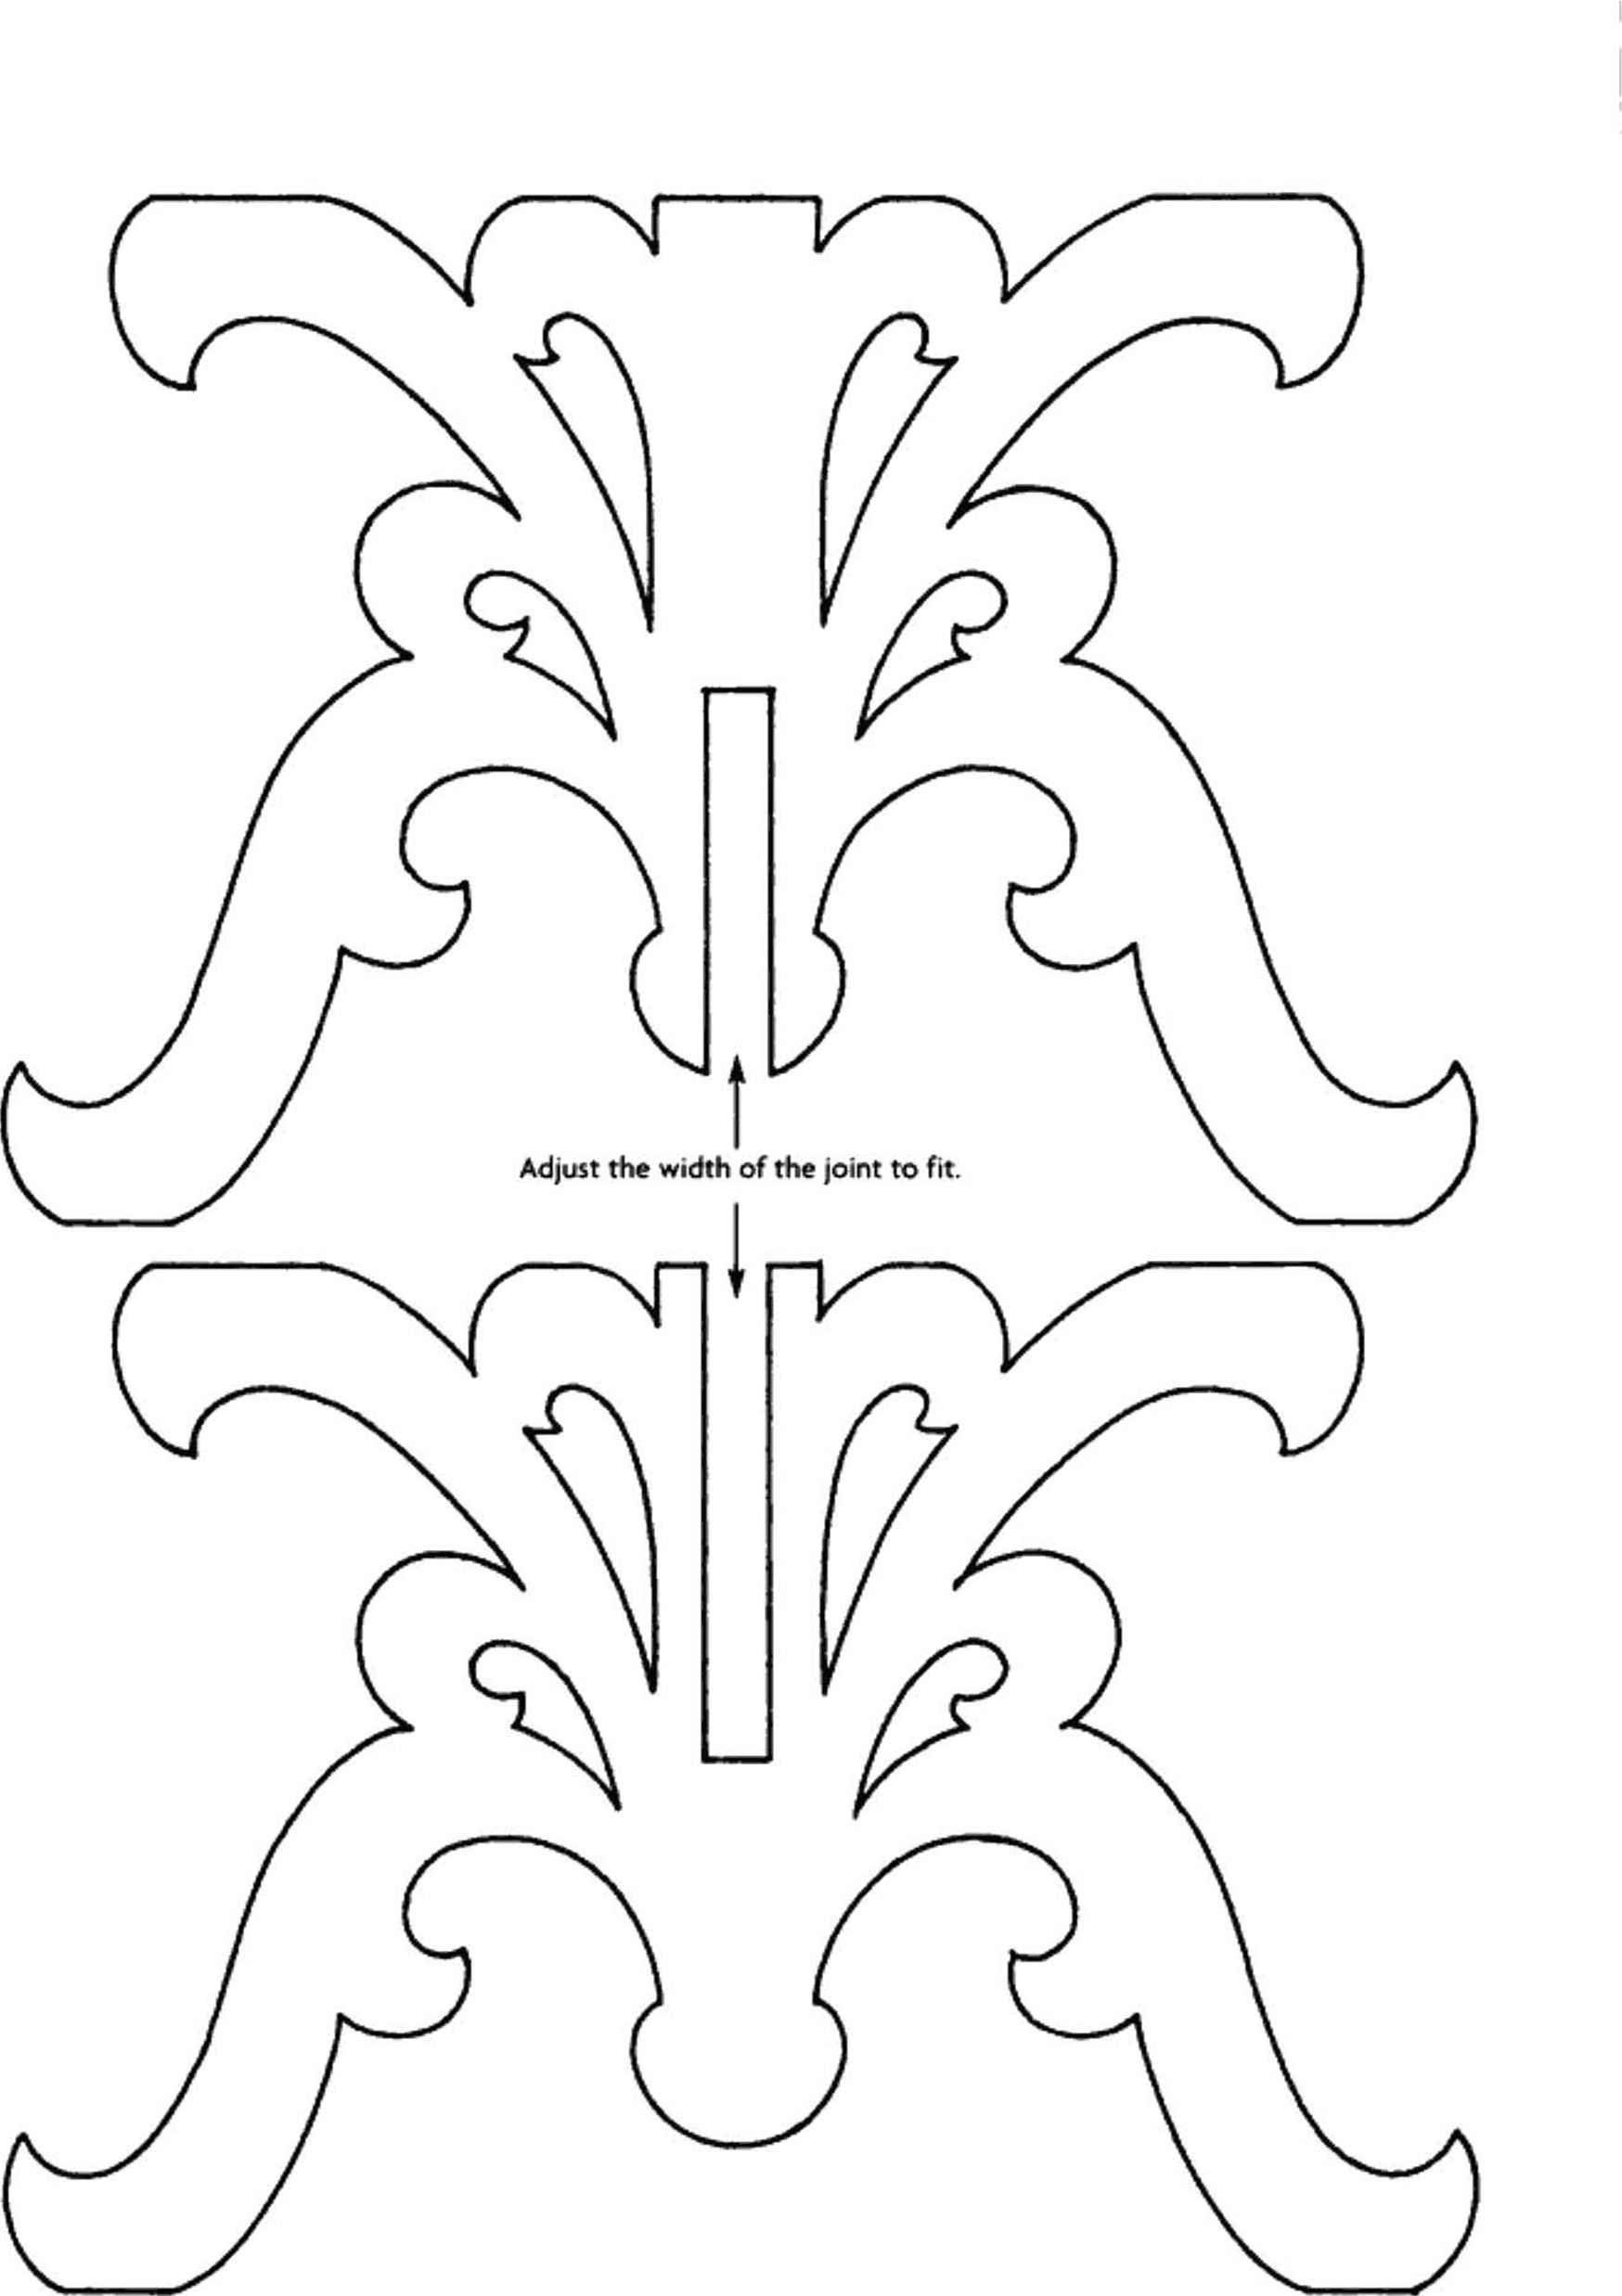 Table legs | Laser | Scroll saw patterns free, Cardboard